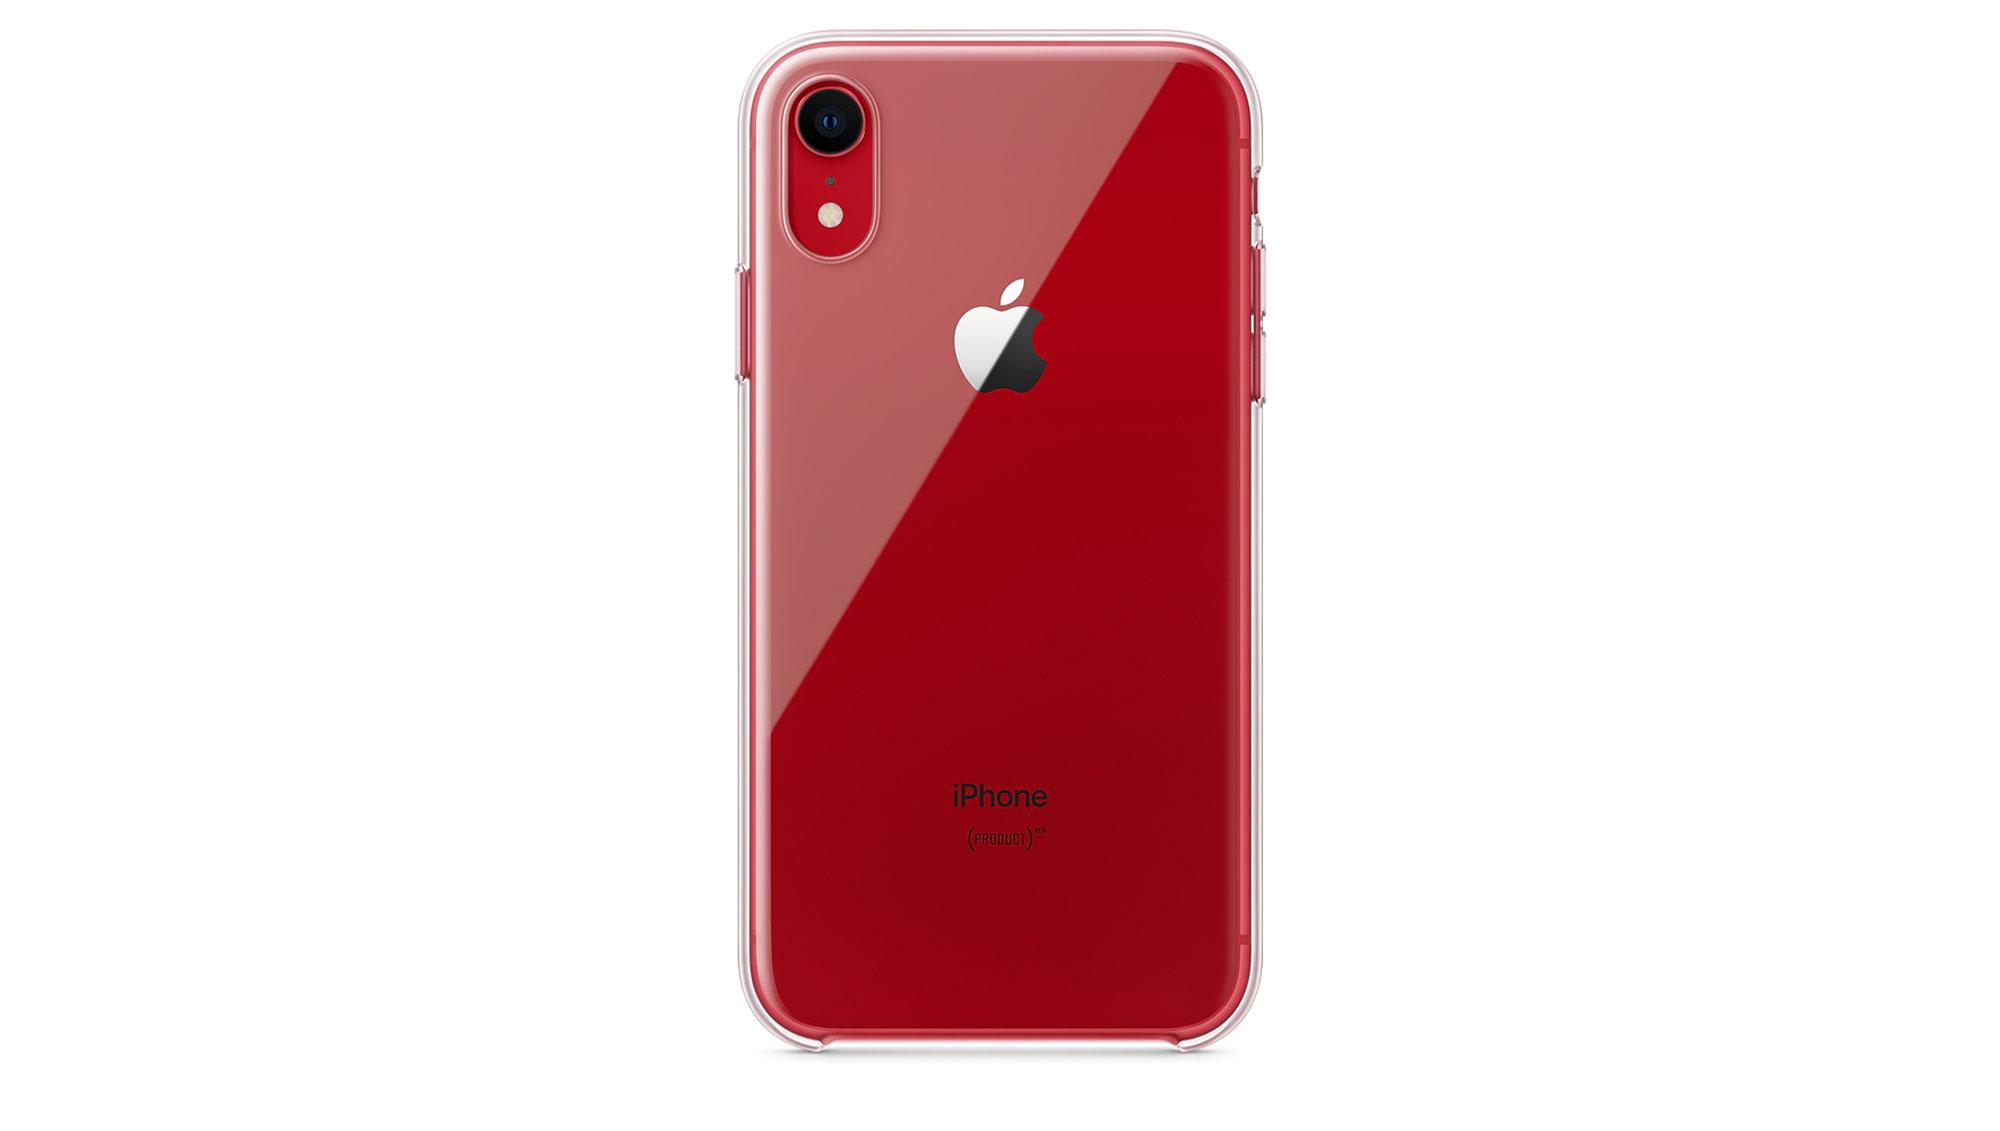 iPhone XR 官方清水保护套已上架苹果官网,完美契合多彩机身